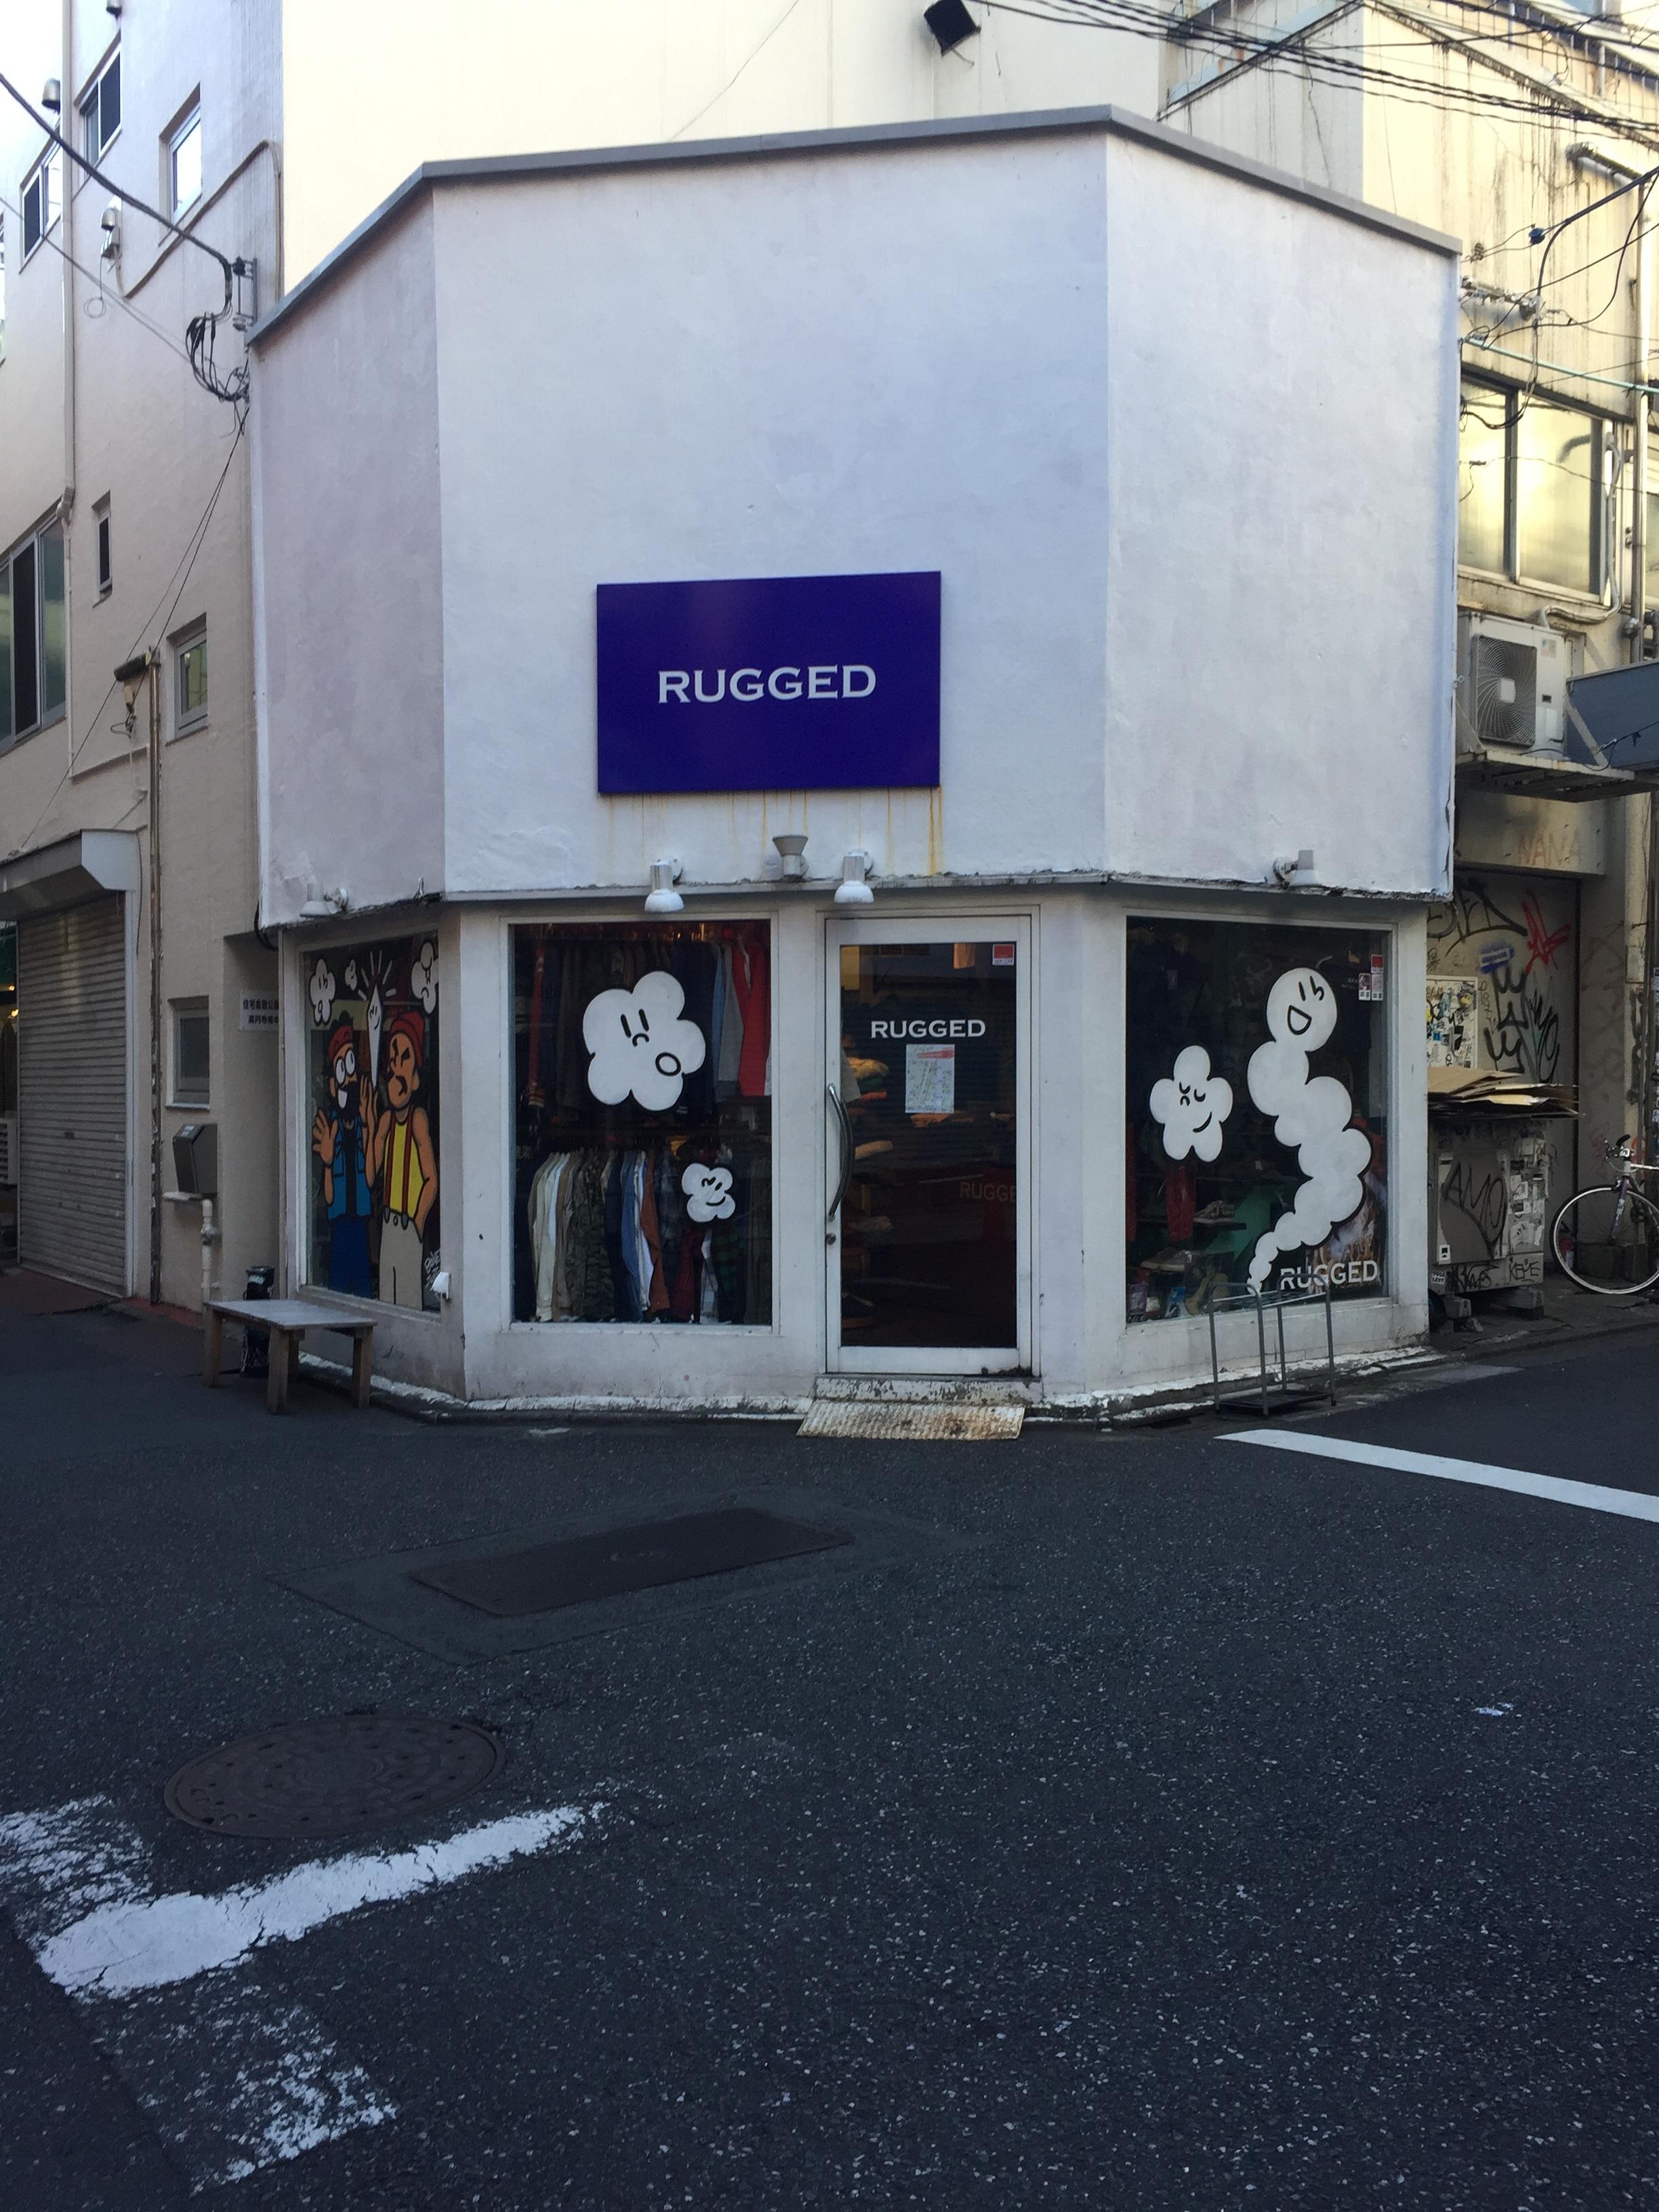 RUGGED(ラギッド)